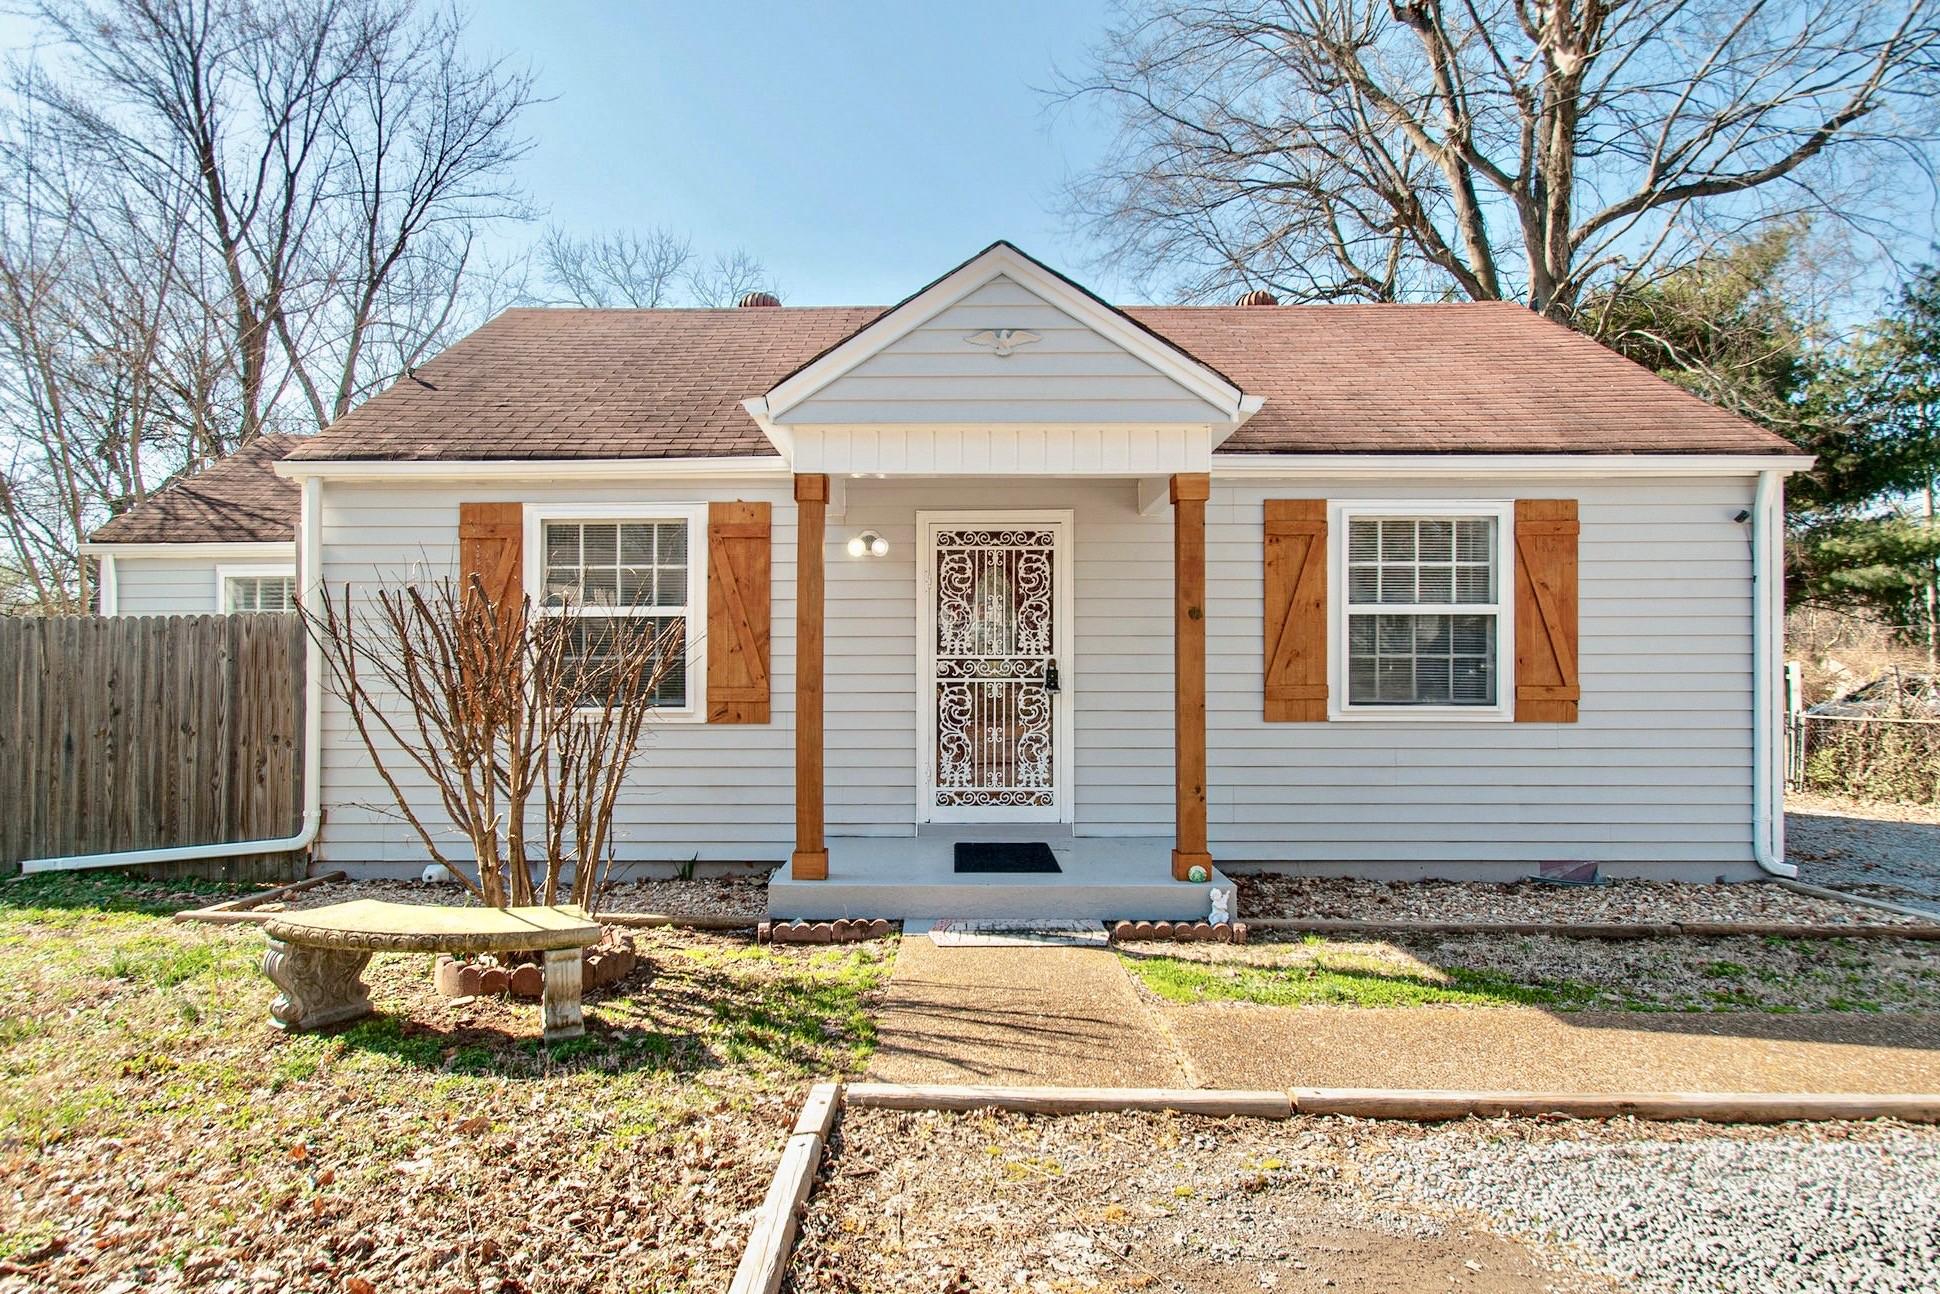 903 Goodbar Dr, Nashville, TN 37217 - Nashville, TN real estate listing